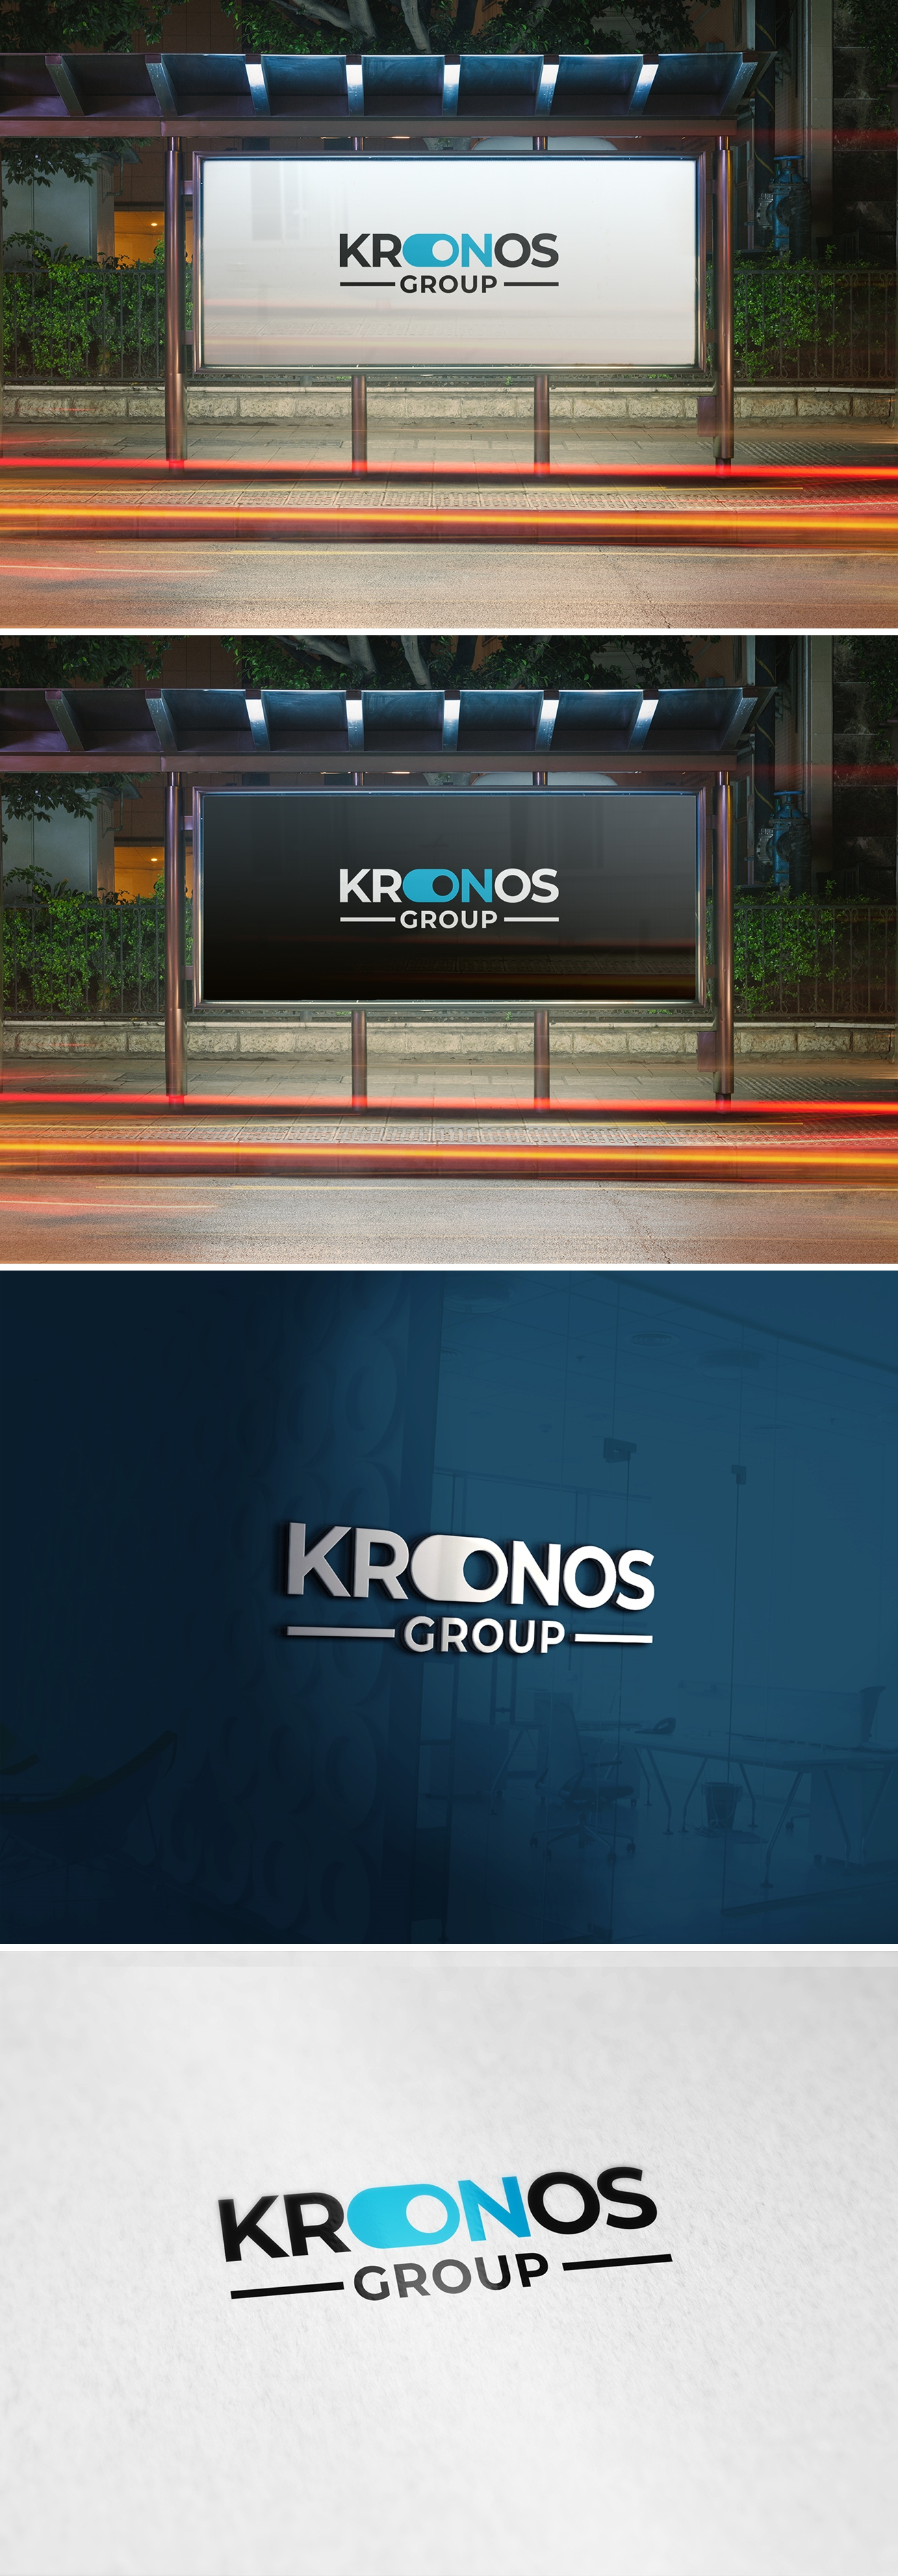 Разработать логотип KRONOS фото f_0005fafe932f196f.jpg